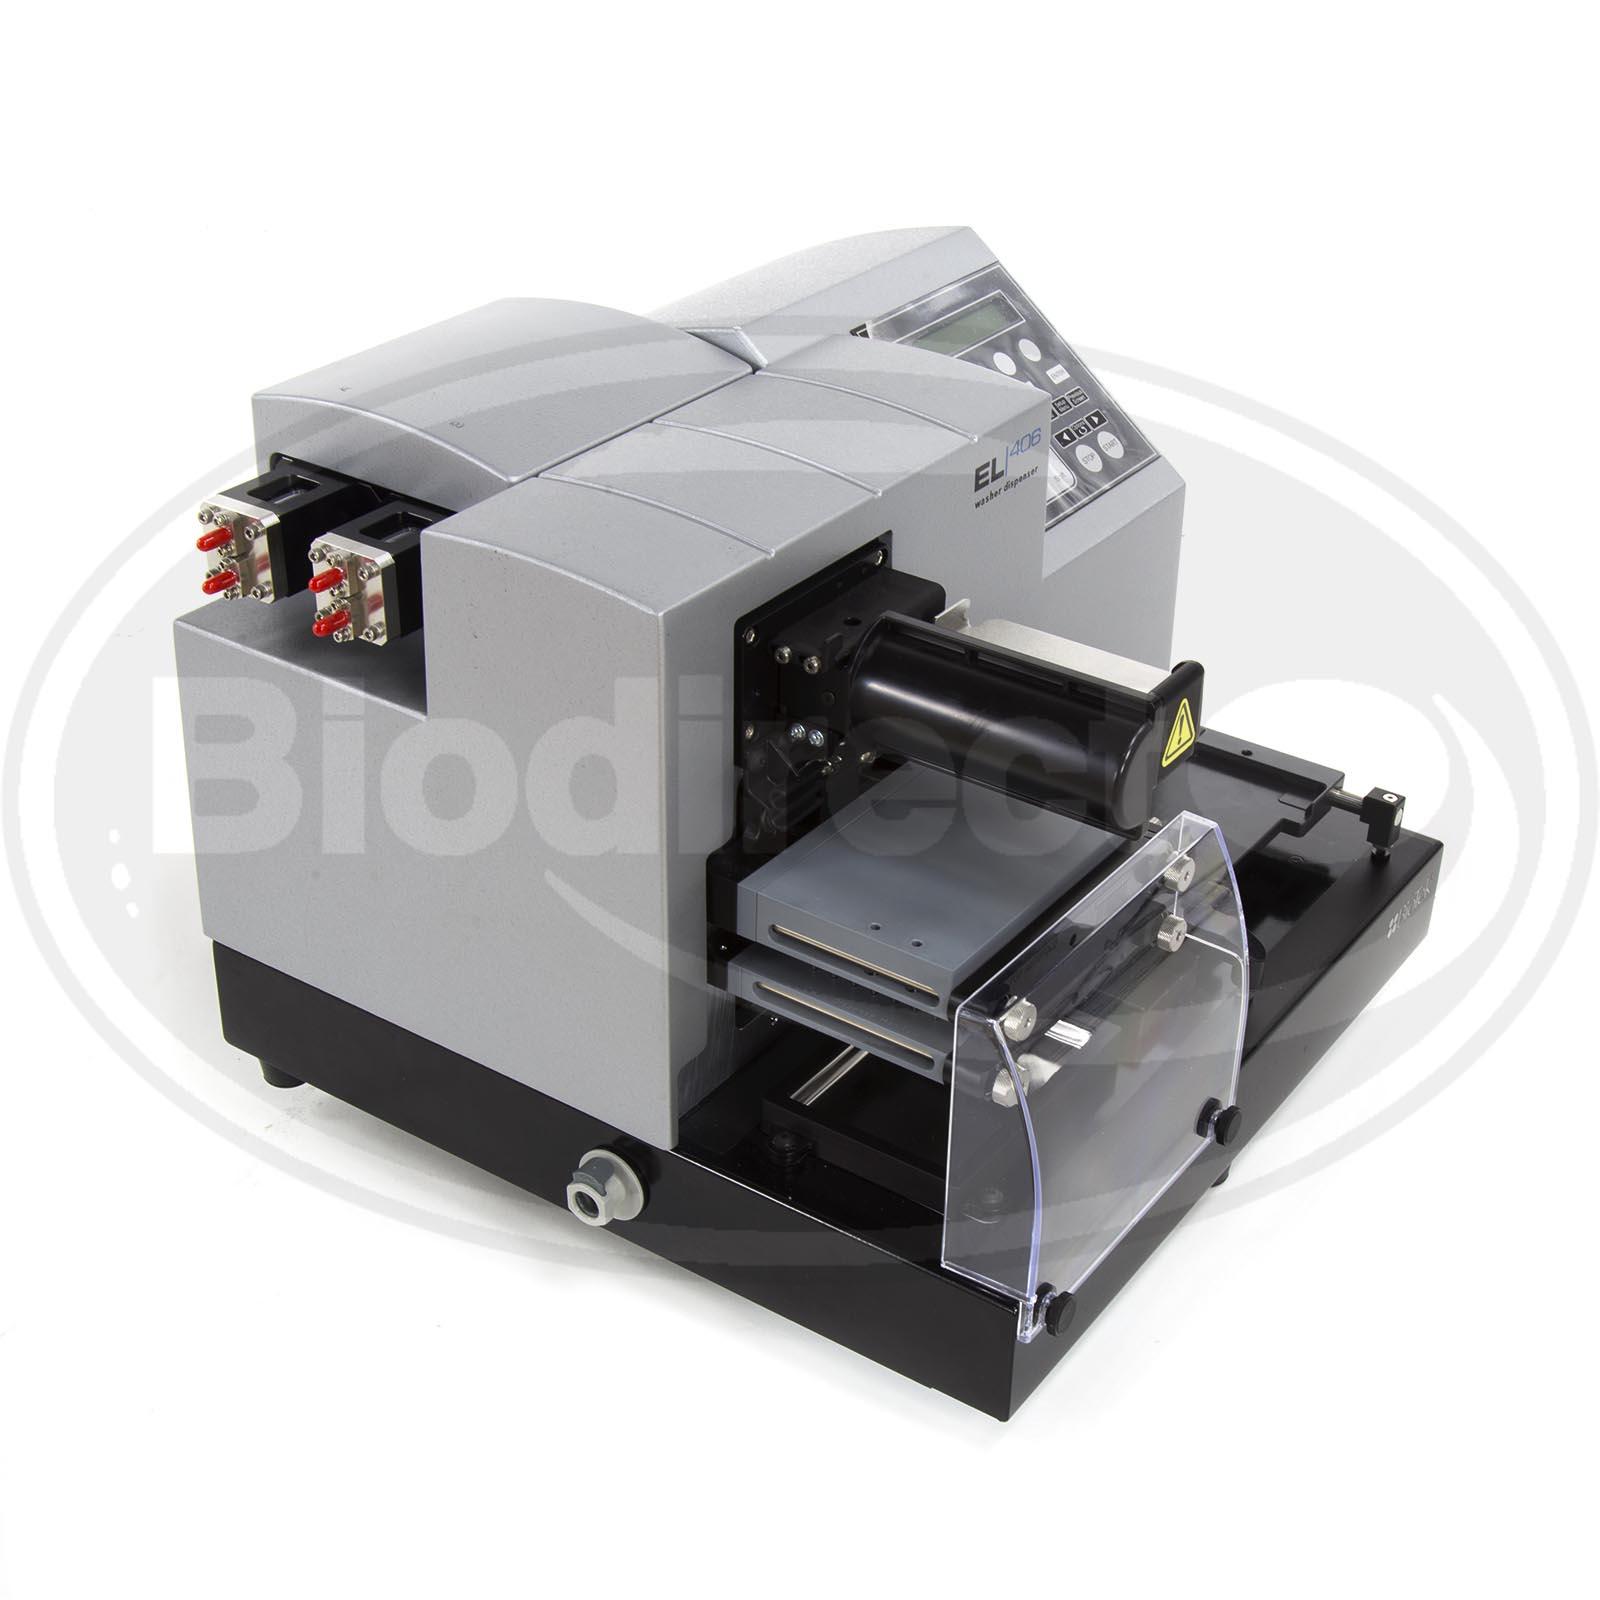 Used Biotek Instruments Microplate Washer El406 For Sale